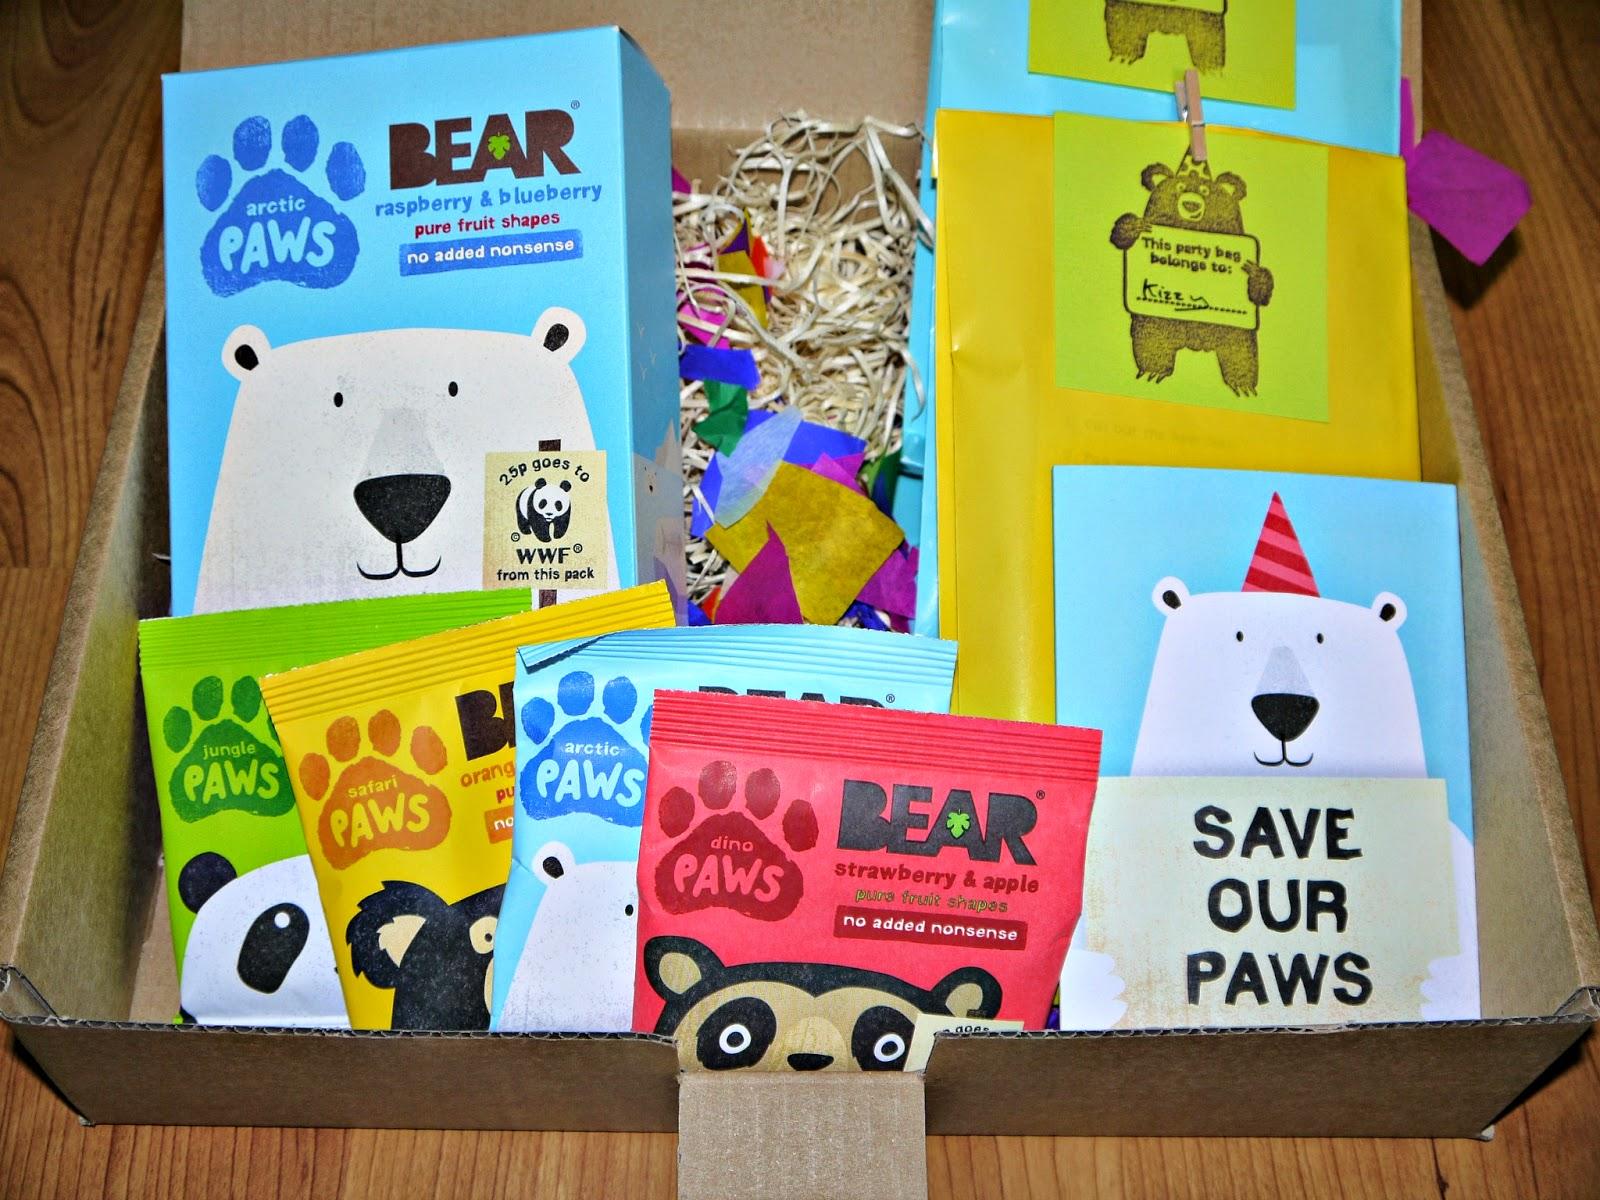 BEAR, bears